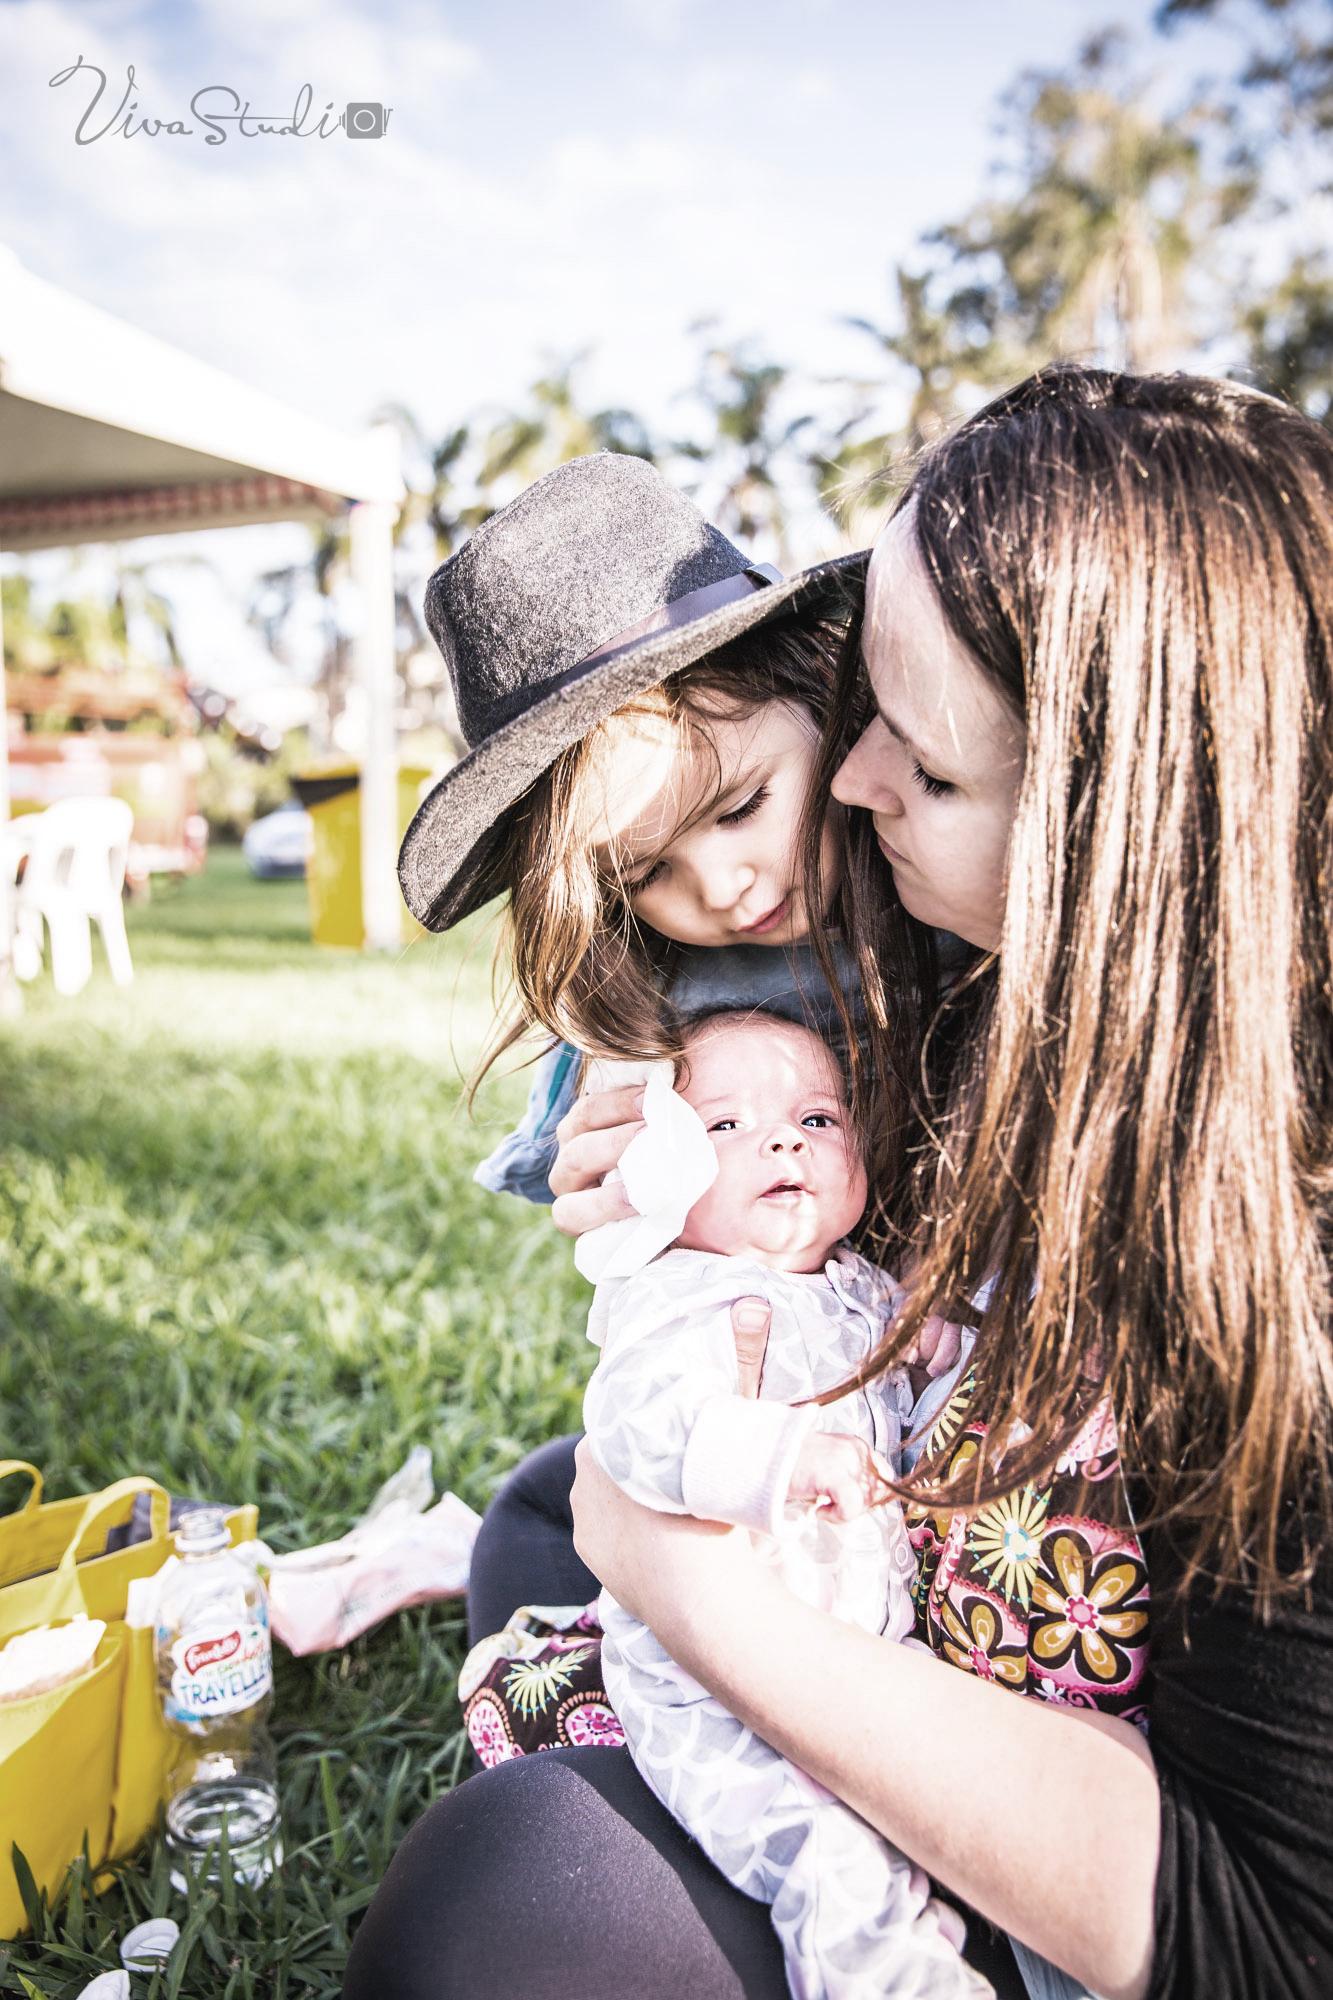 VivaStudio_Newborn_Baby_Family_Photography_Toowoong_Perrin_Park_Brisbane_024